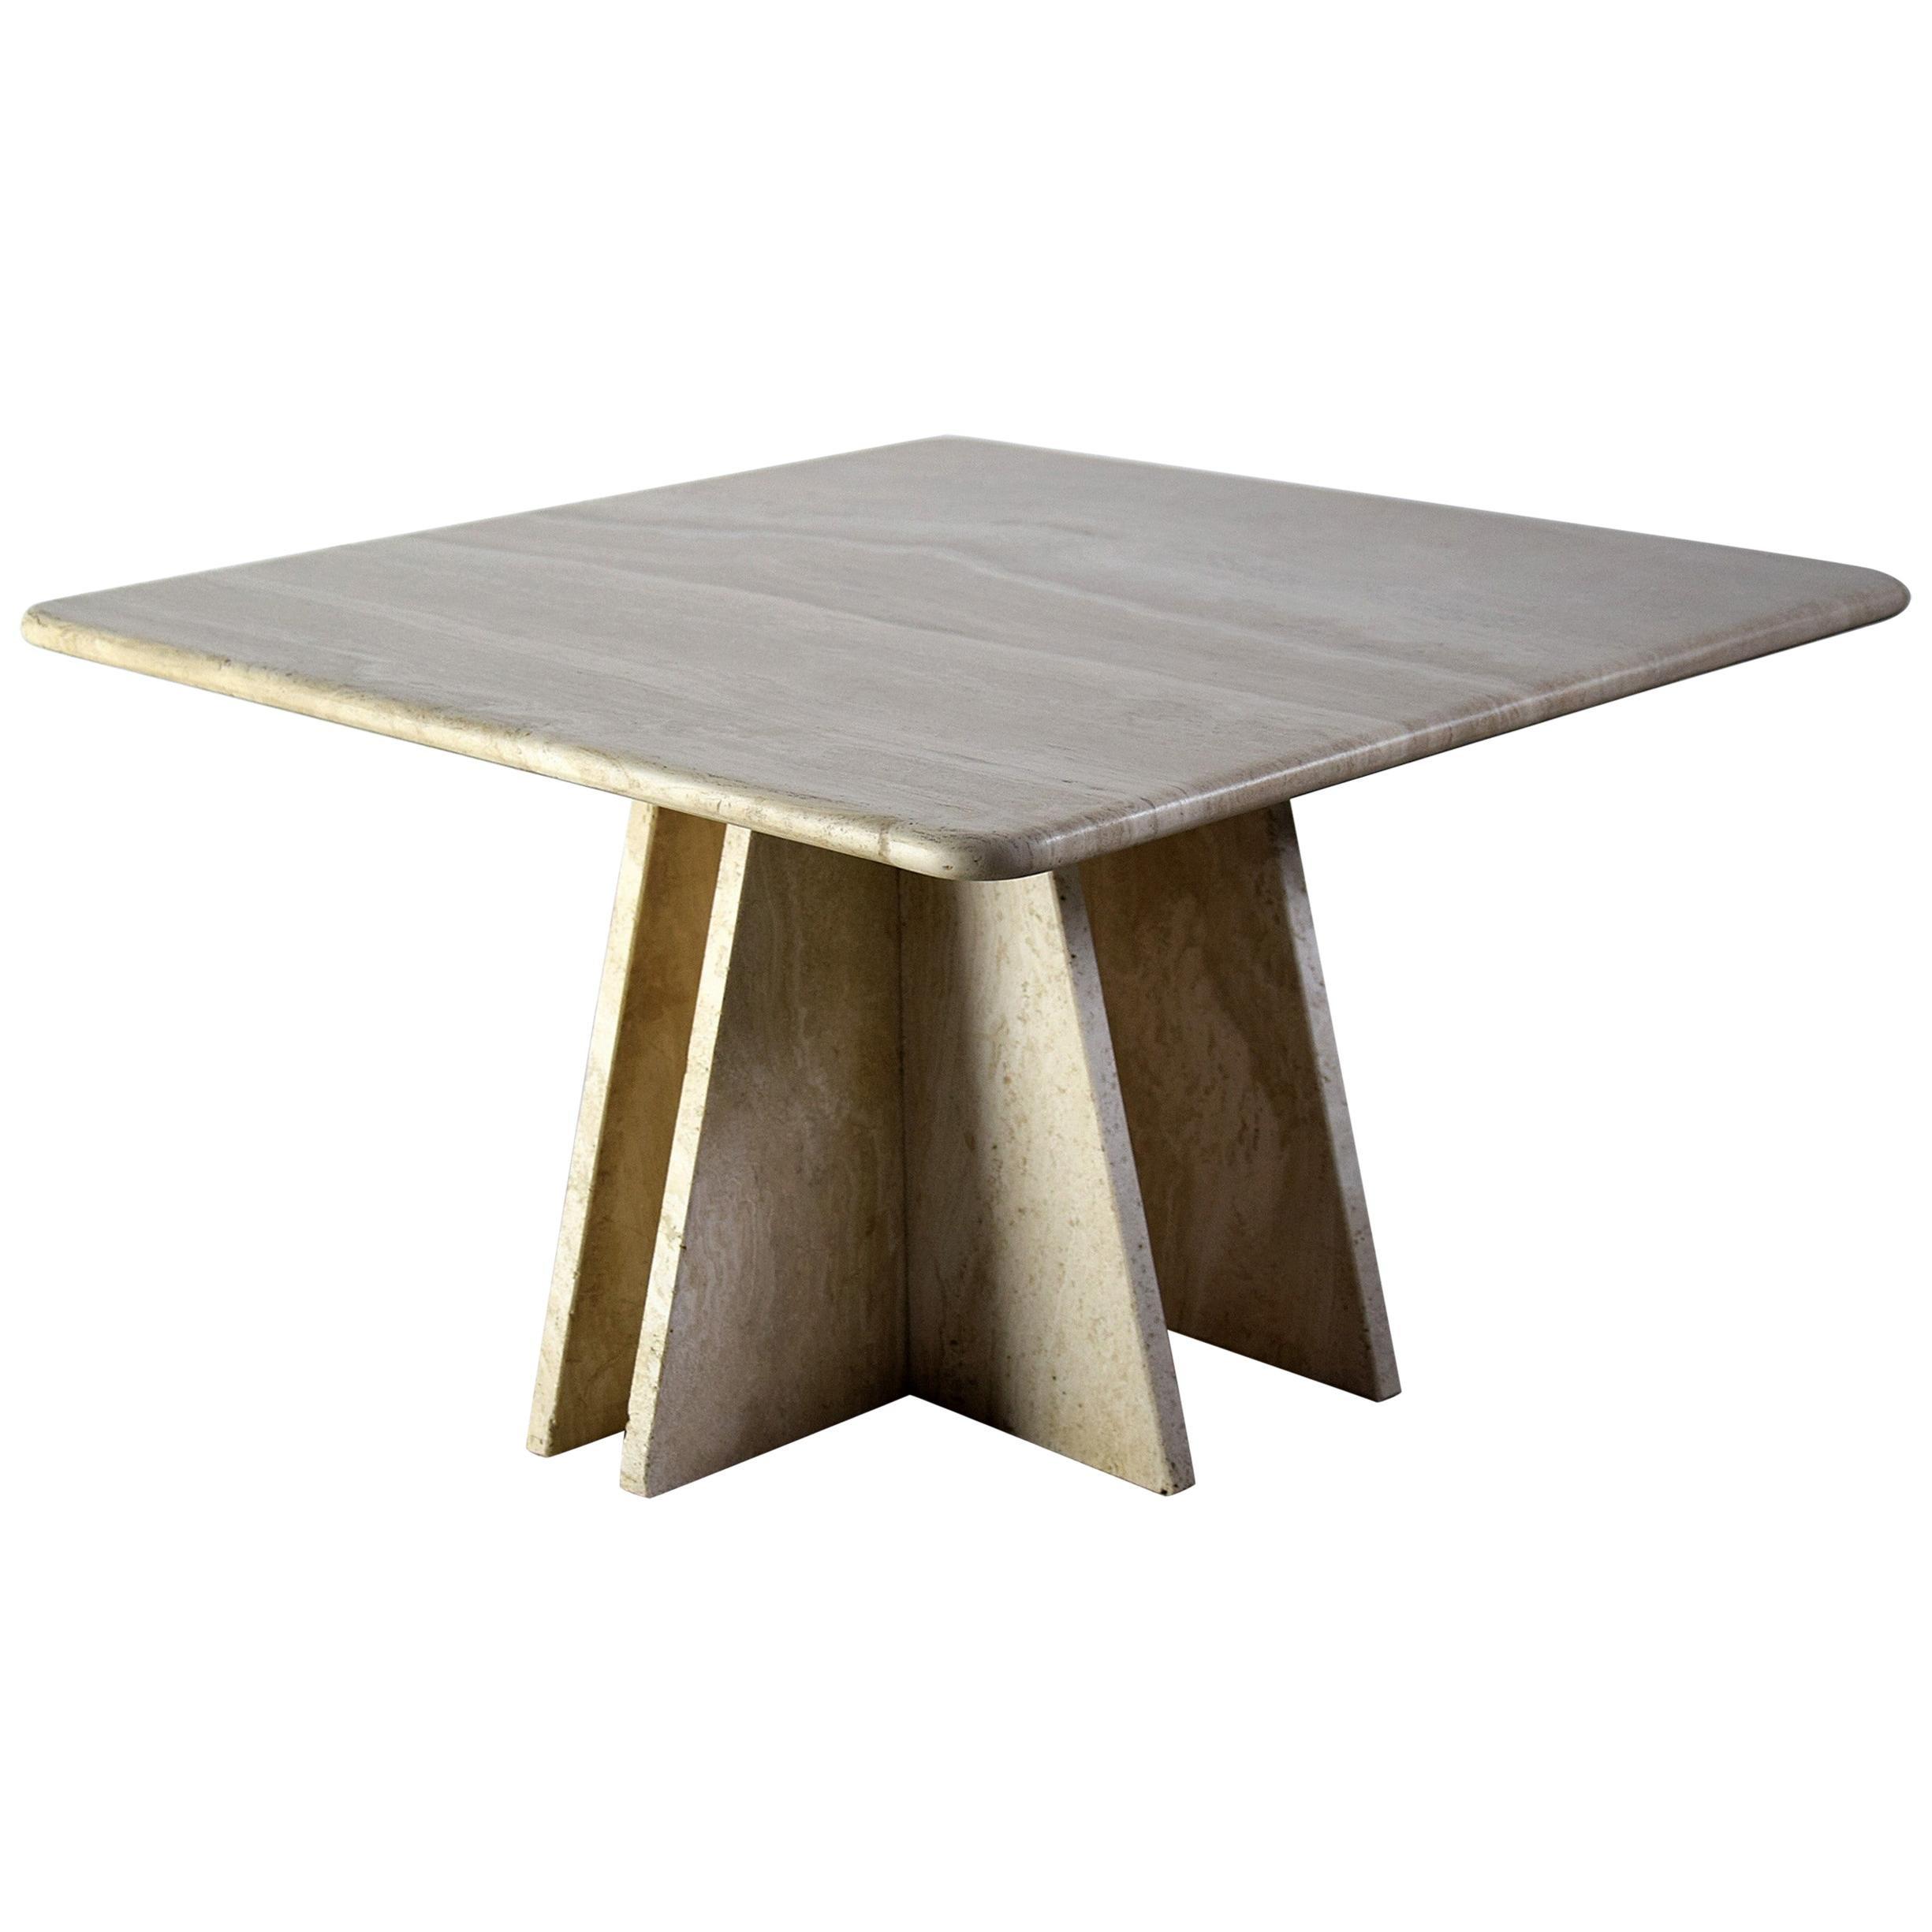 Italian Mid-Century Modern Travertine Coffee Table